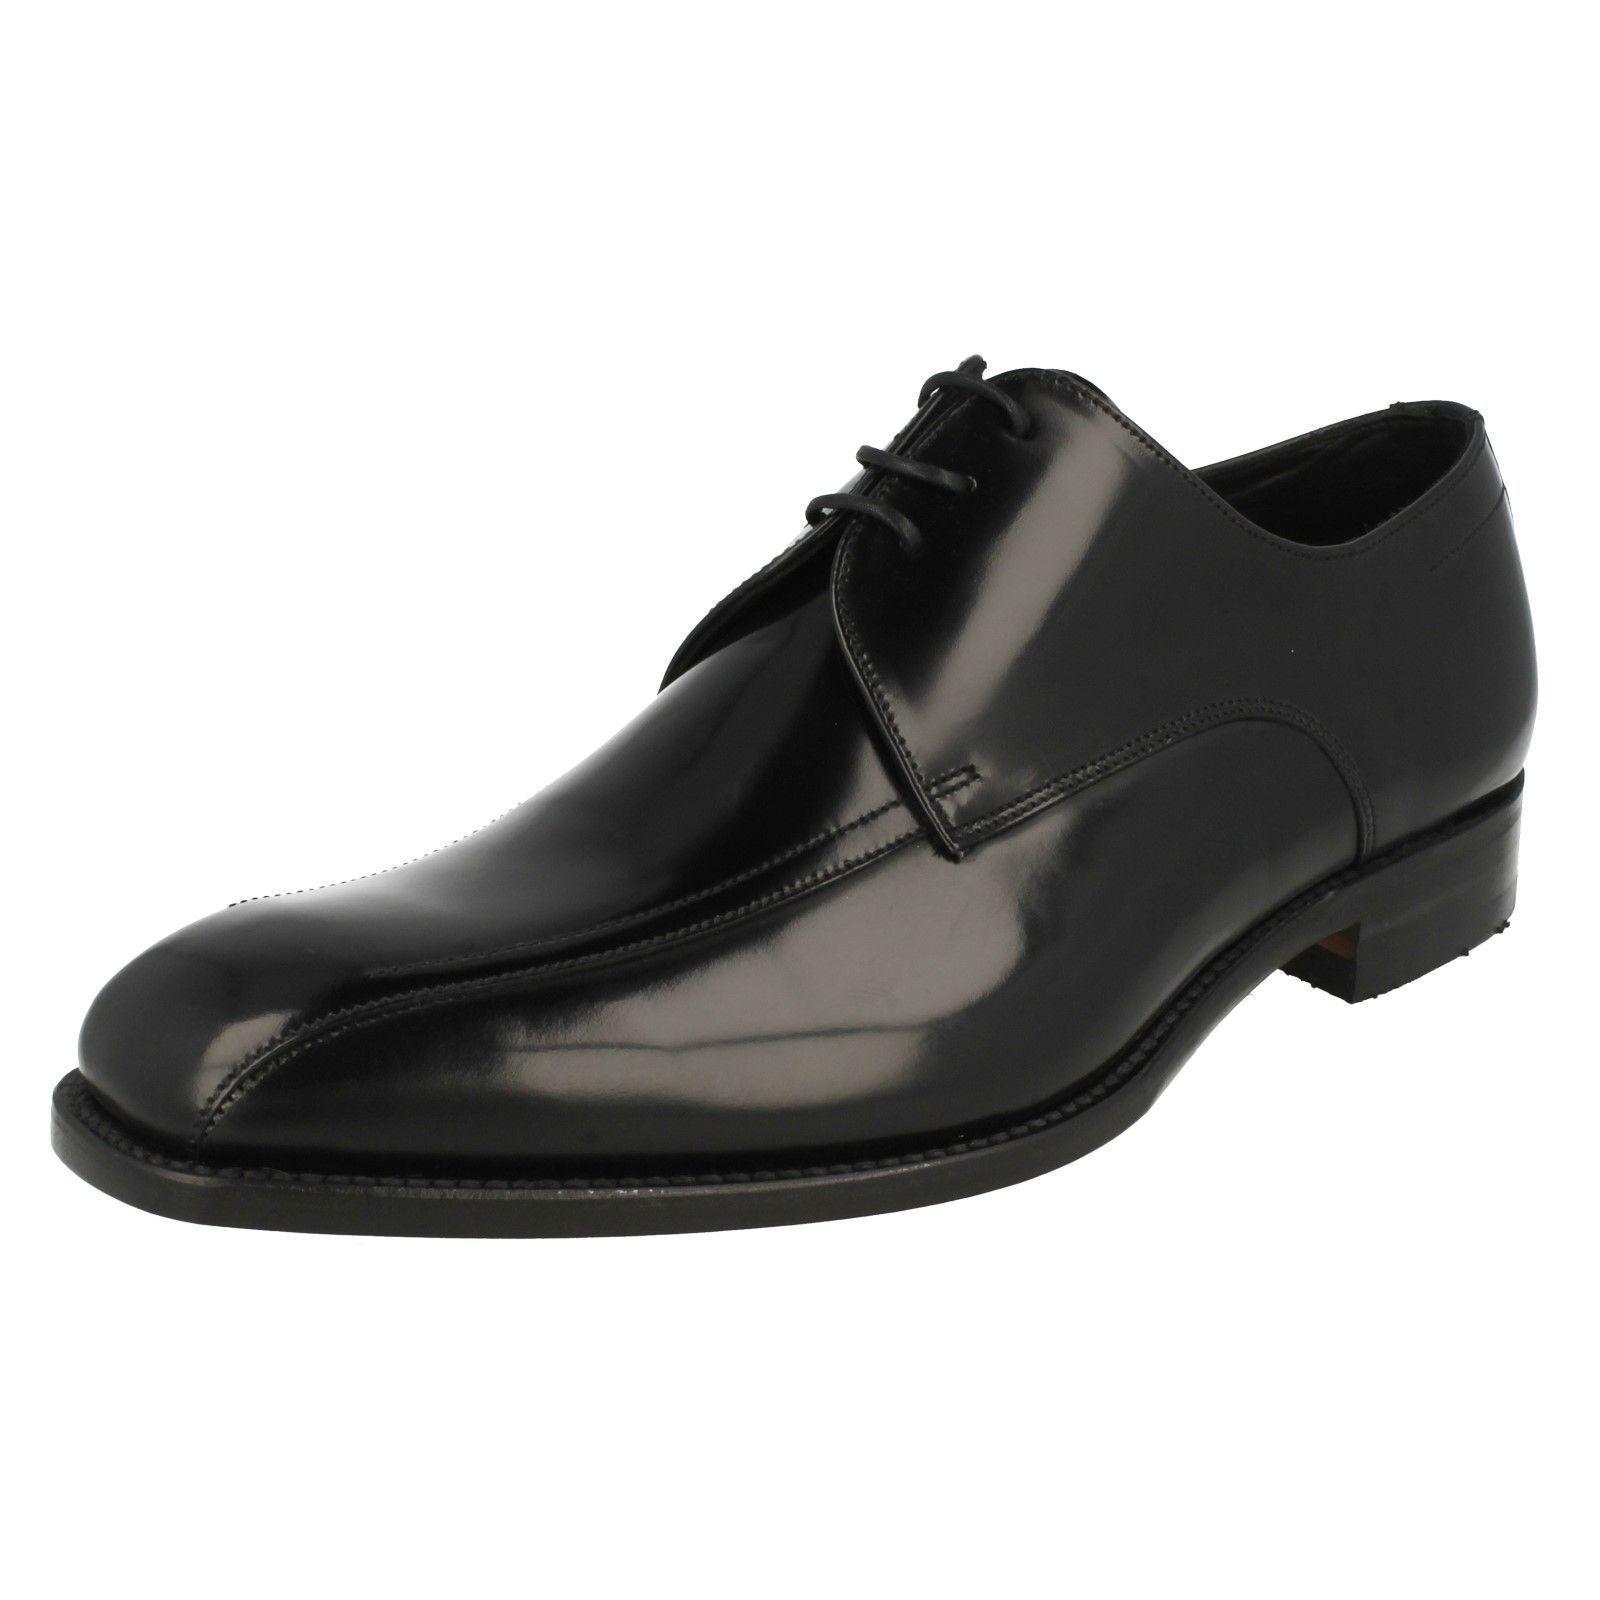 Loakes Herren Schwarz Leder Spitze UK Oben Schuhe UK Spitze Größen 7.5 - 11 F Passung ccc792